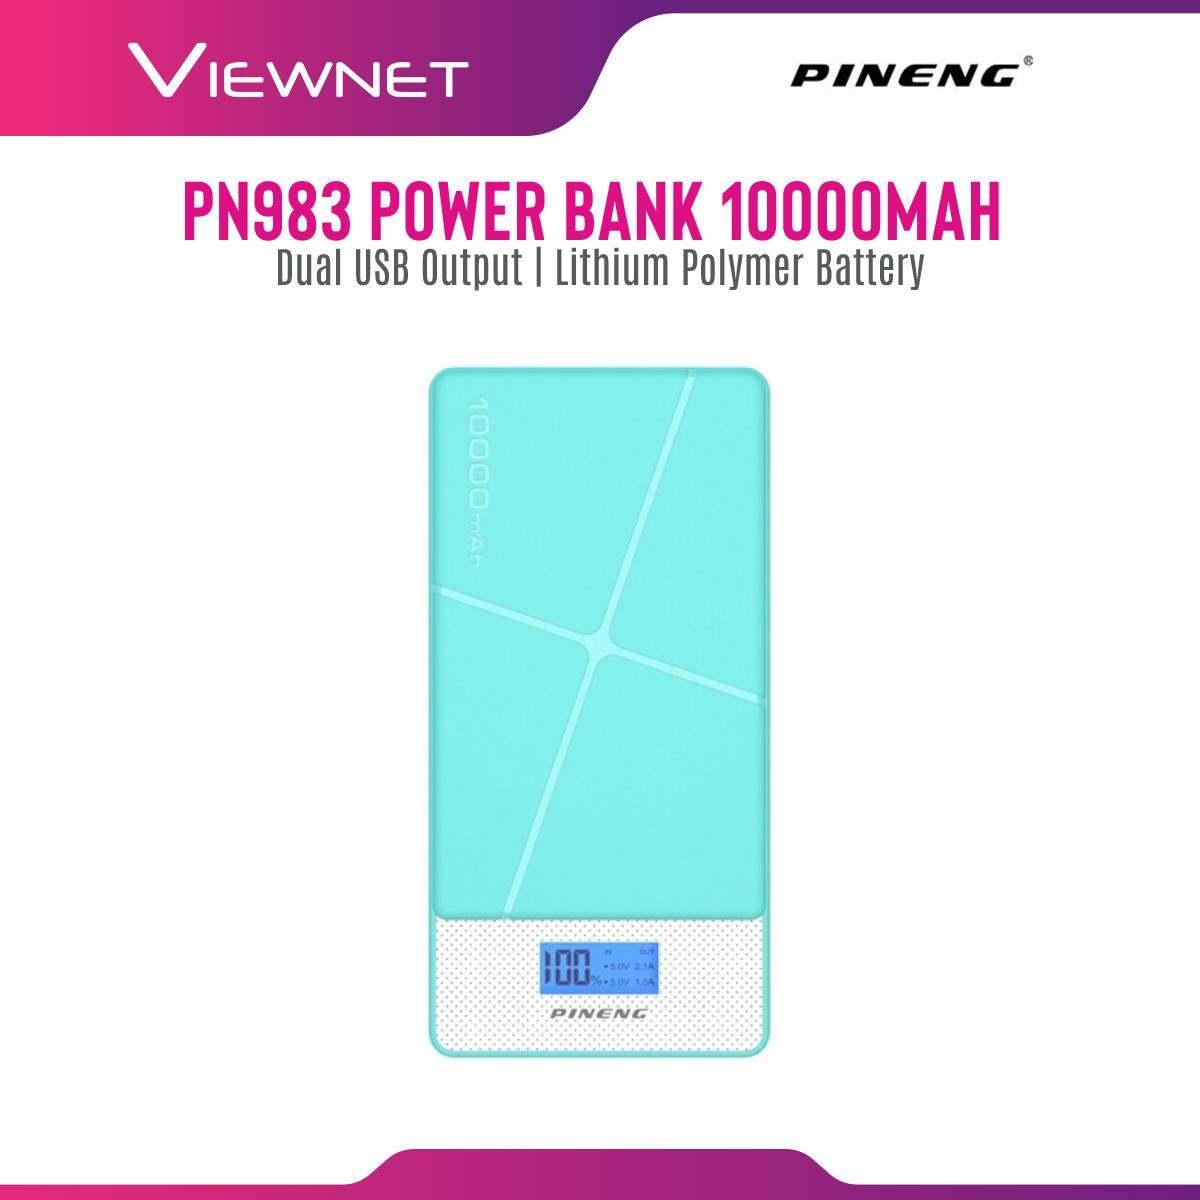 Pineng 10000mAh Power Bank (PN-983S) 2-Out 2.1A, Input DC5V 1A, Output 5V~1A, 5V~2.1A, Li-Polymer Battery, Blue / Pink